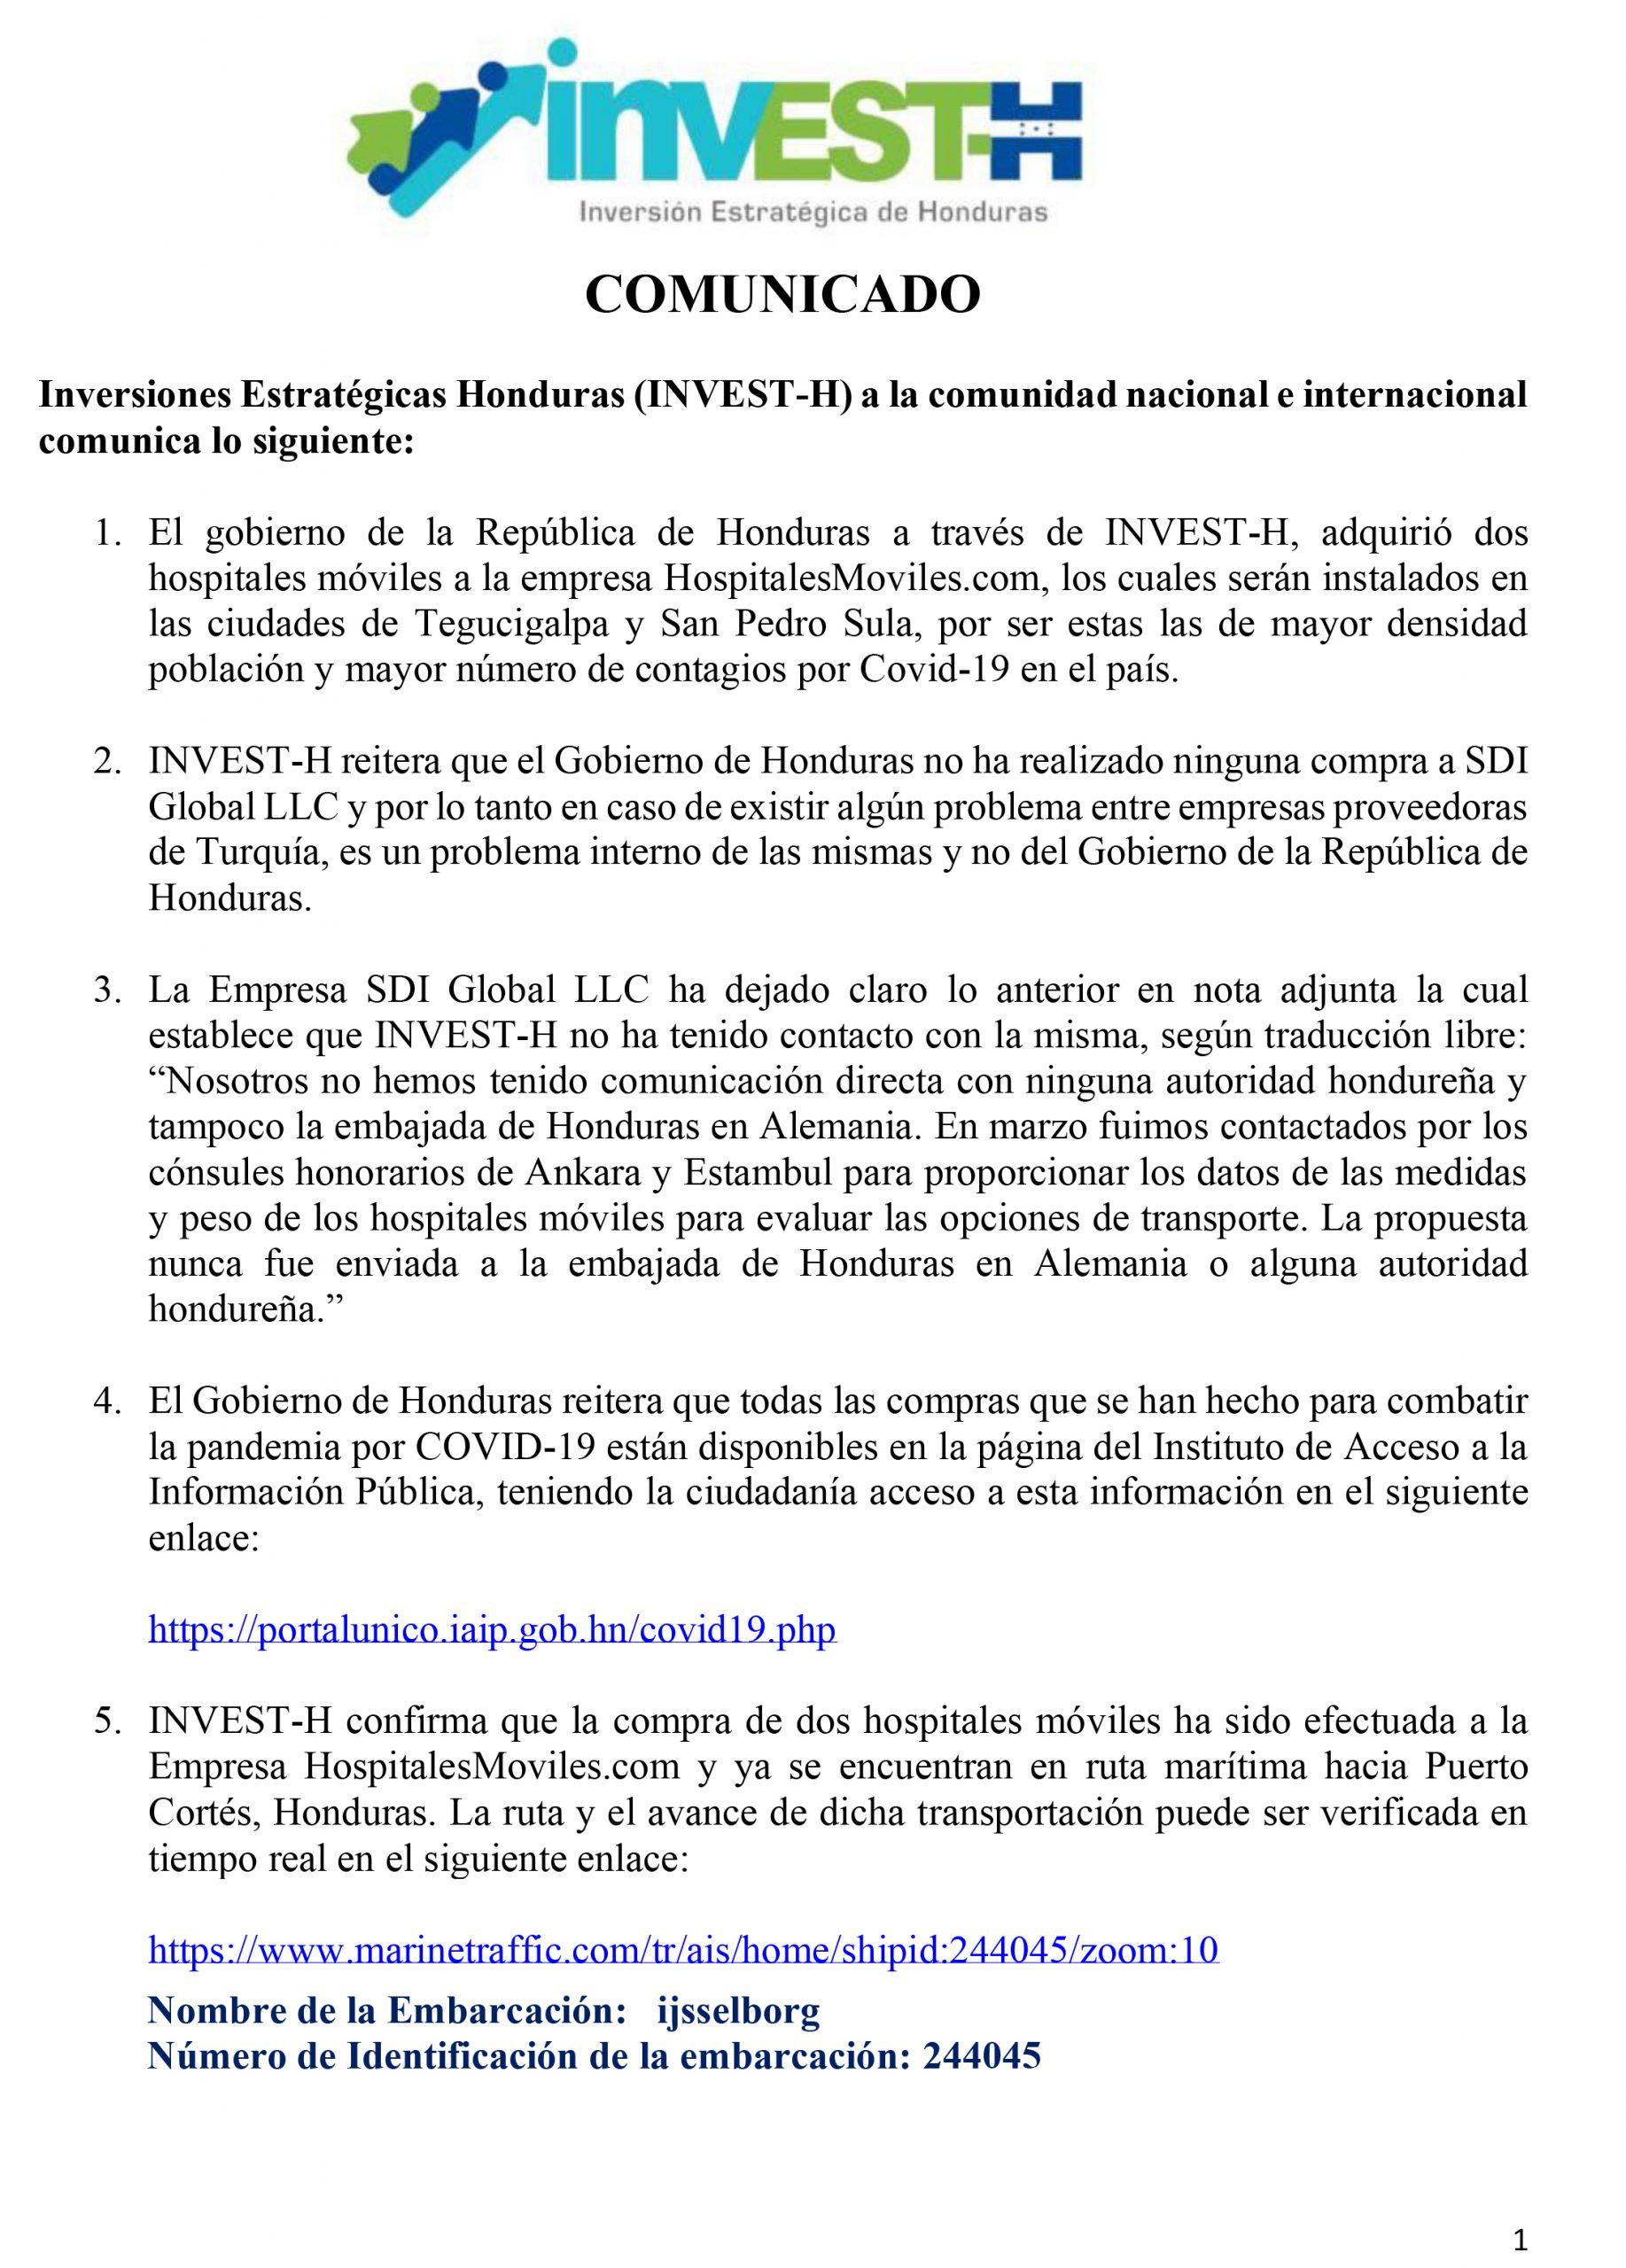 NVEST-H dice que hospitales móviles están en ruta marítima a Honduras